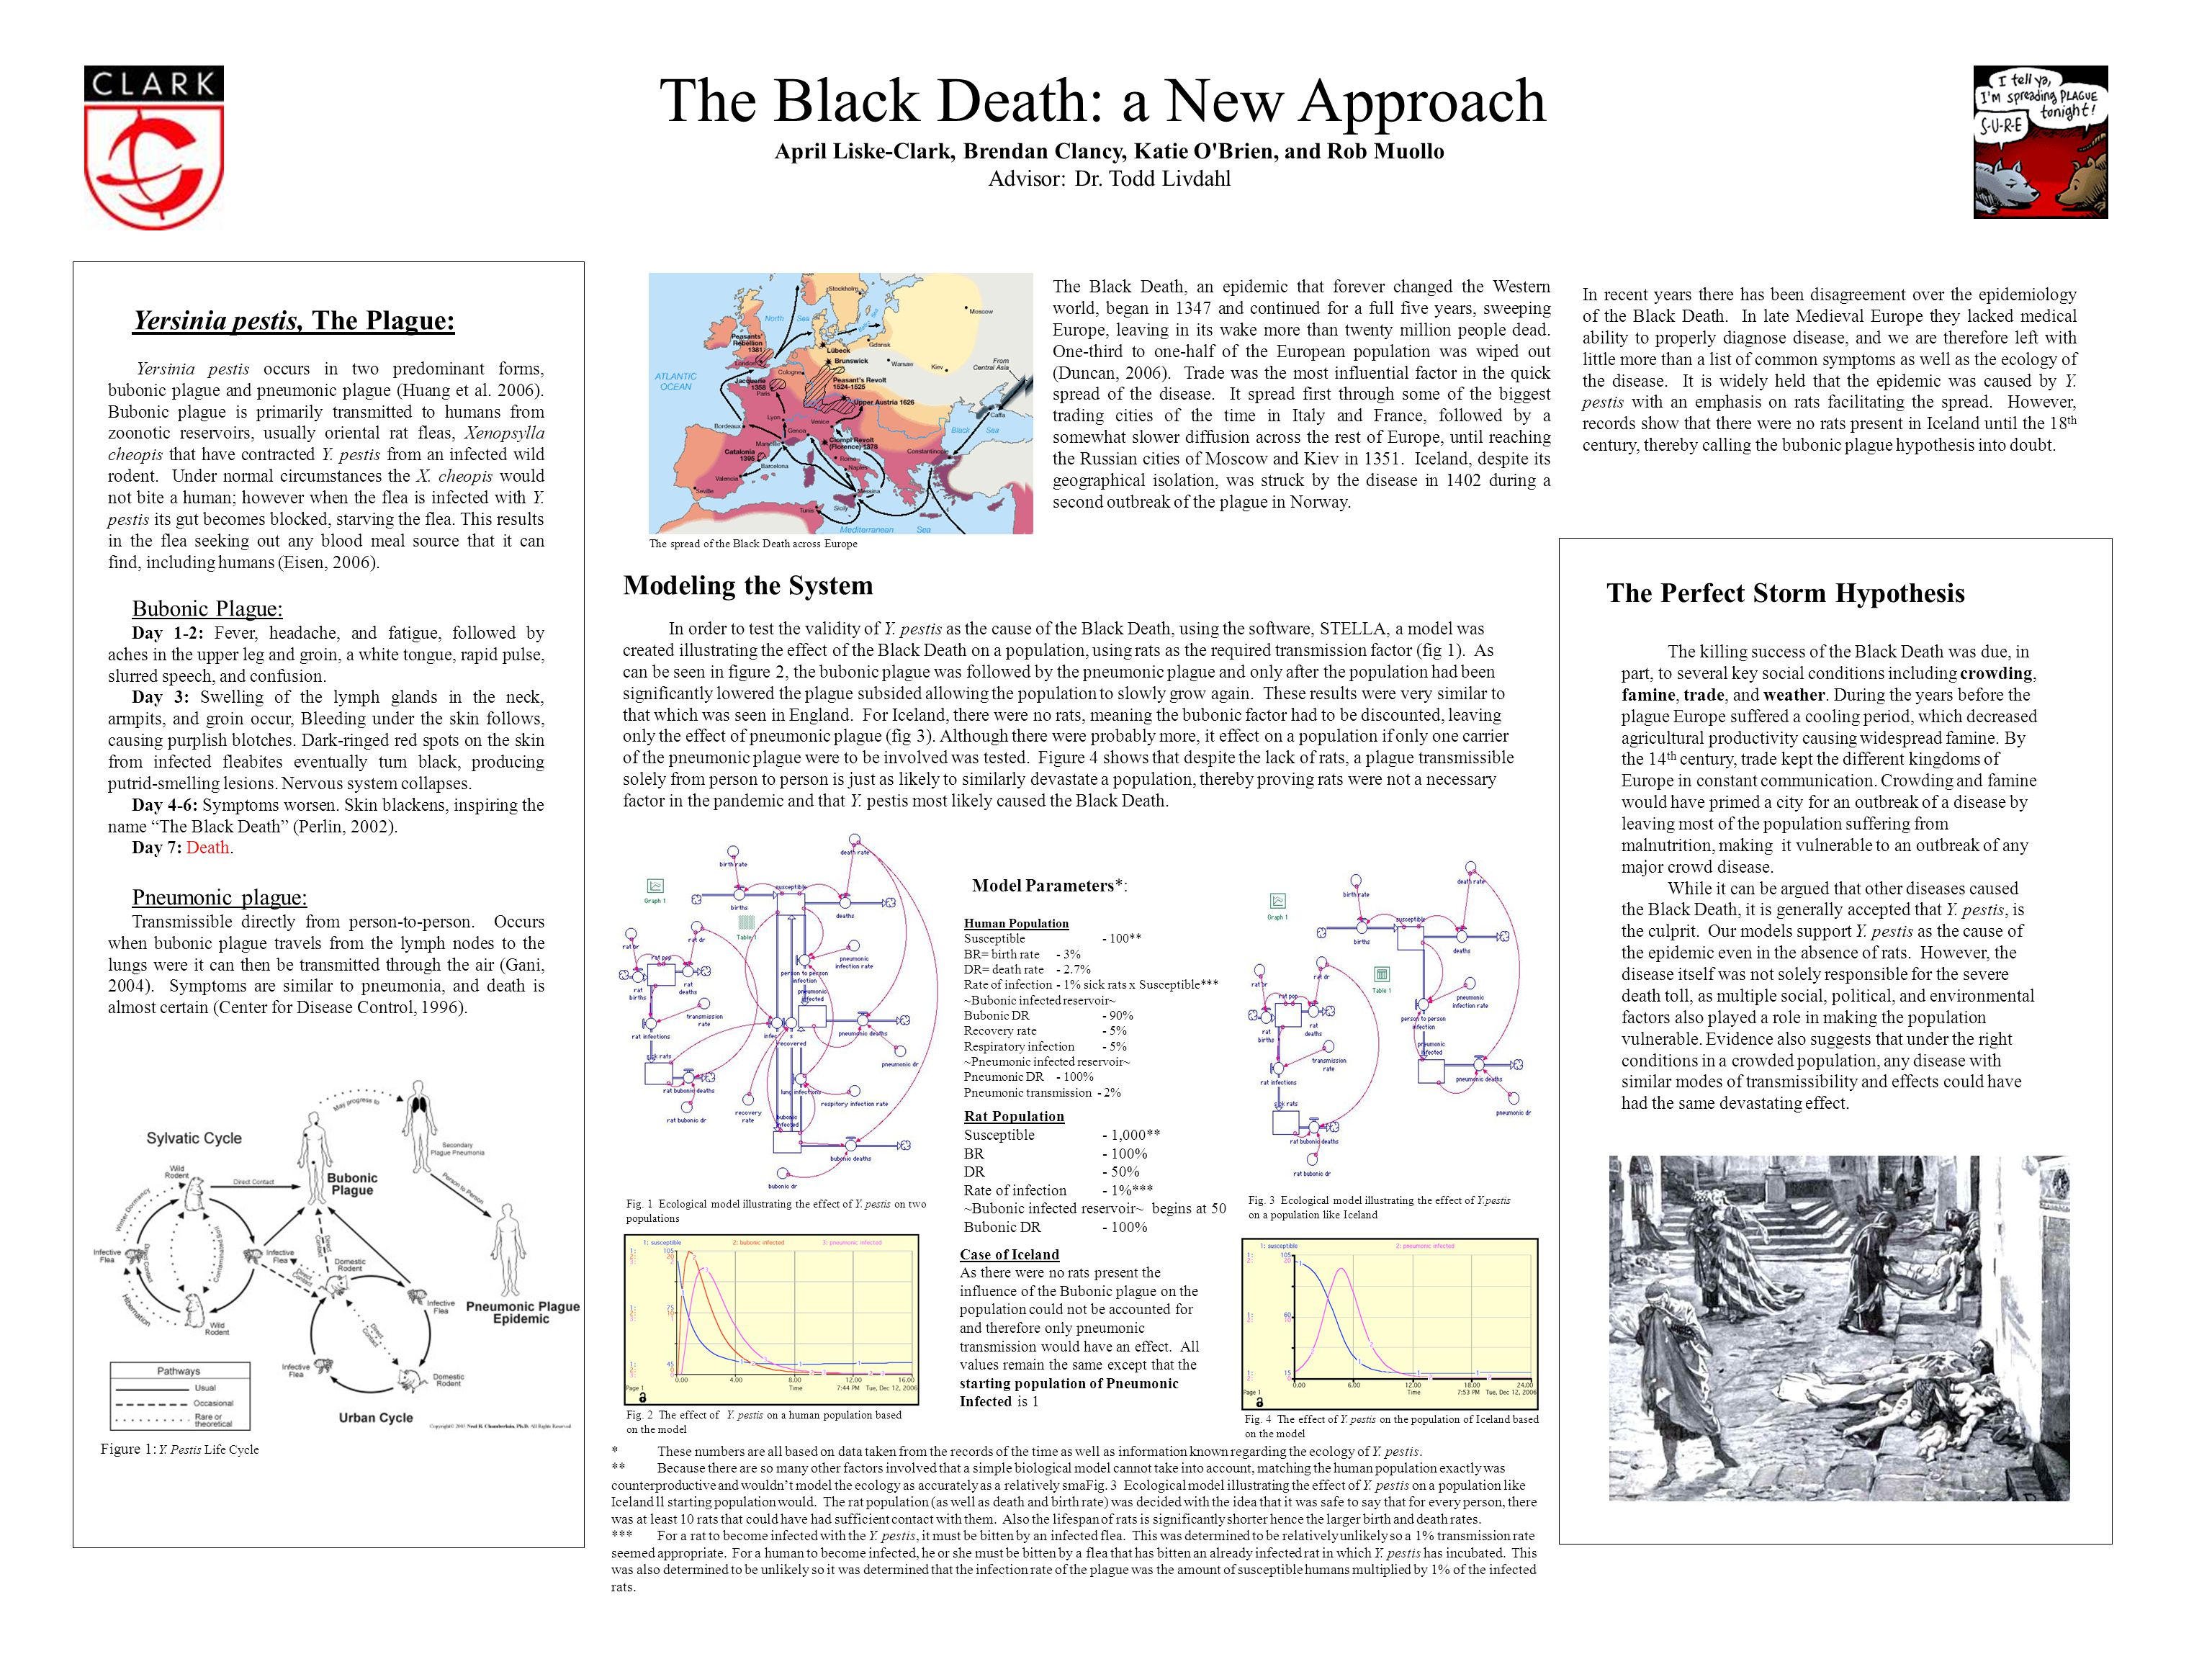 The Black Death: a New Approach April Liske-Clark, Brendan Clancy, Katie O'Brien, and Rob Muollo Advisor: Dr. Todd Livdahl Yersinia pestis, The Plague